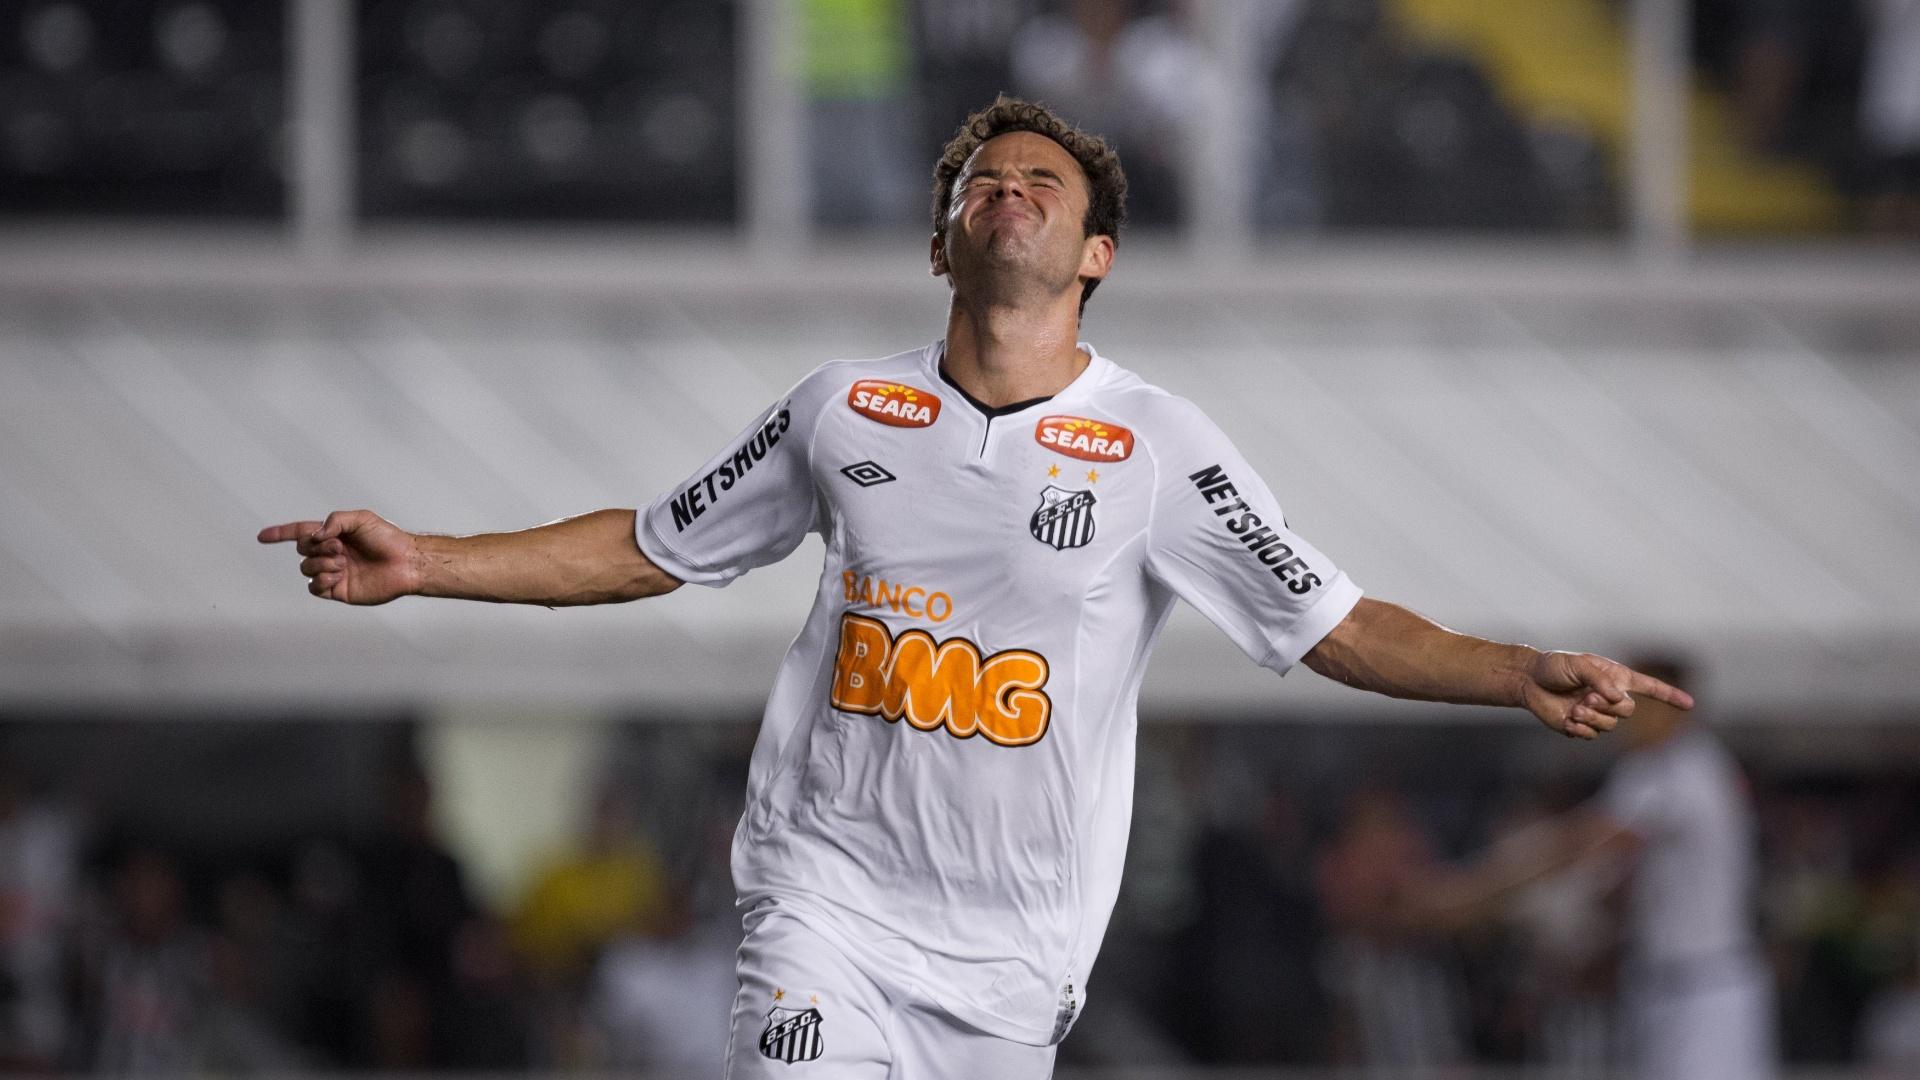 Juan comemora após marcar o terceiro gol do Santos contra o Guaratinguetá